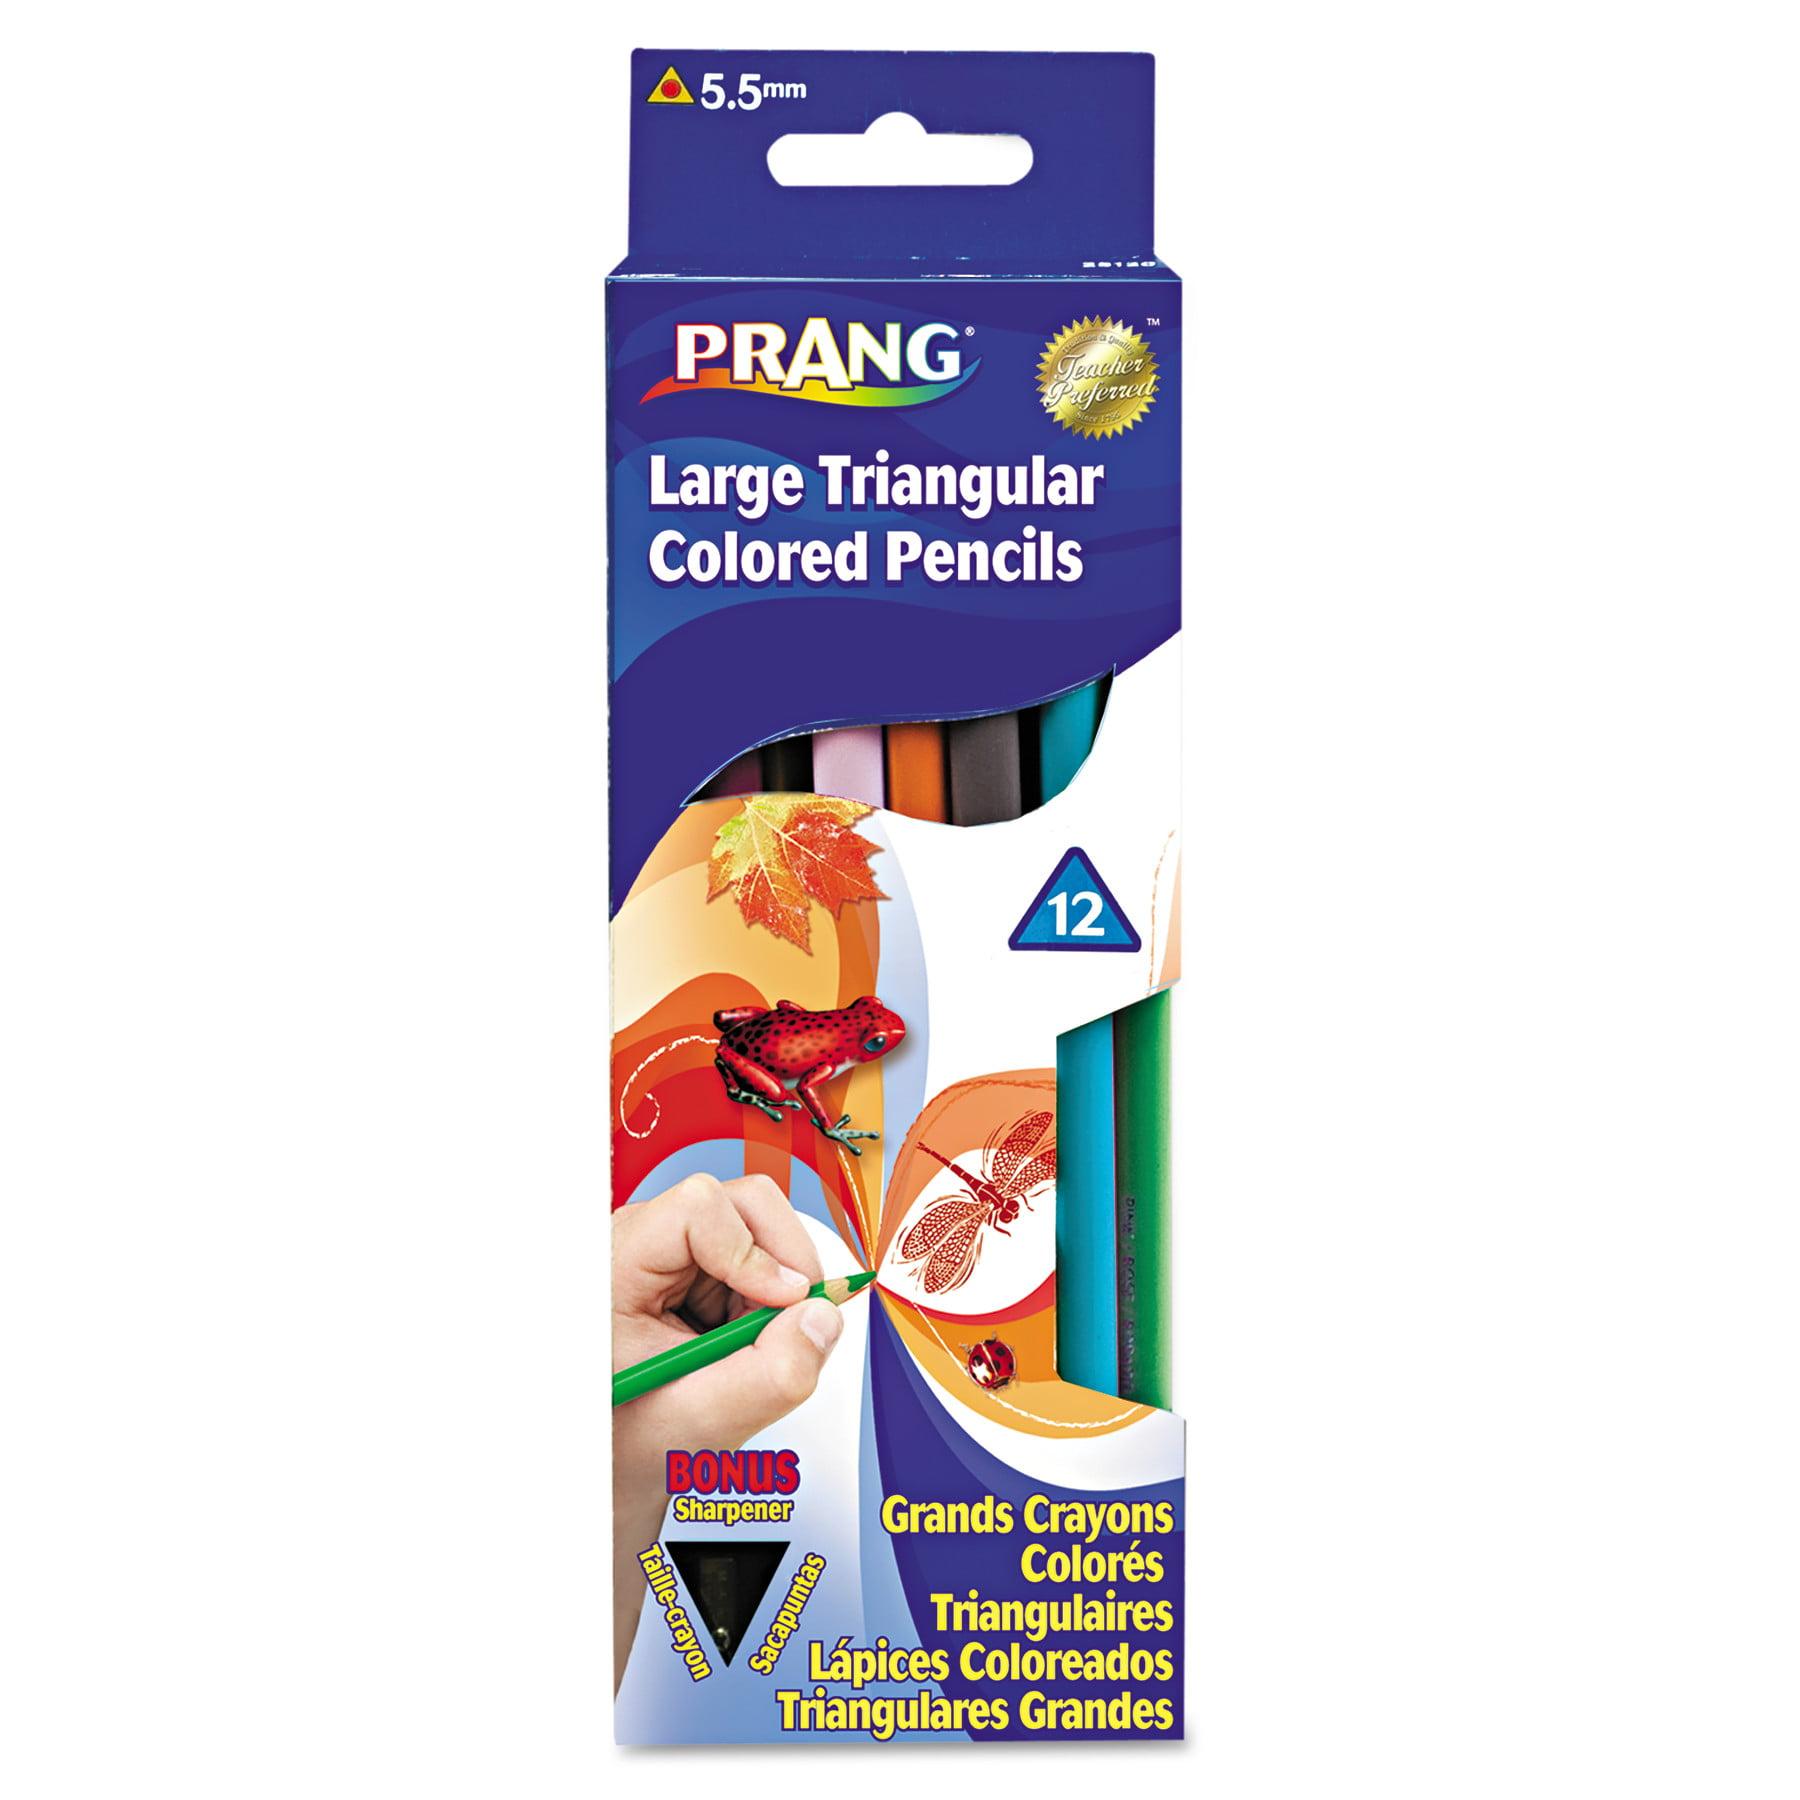 Prang Prang Triangular Colored Woodcase Pencil, 5.5 mm, Assorted, 12/Set